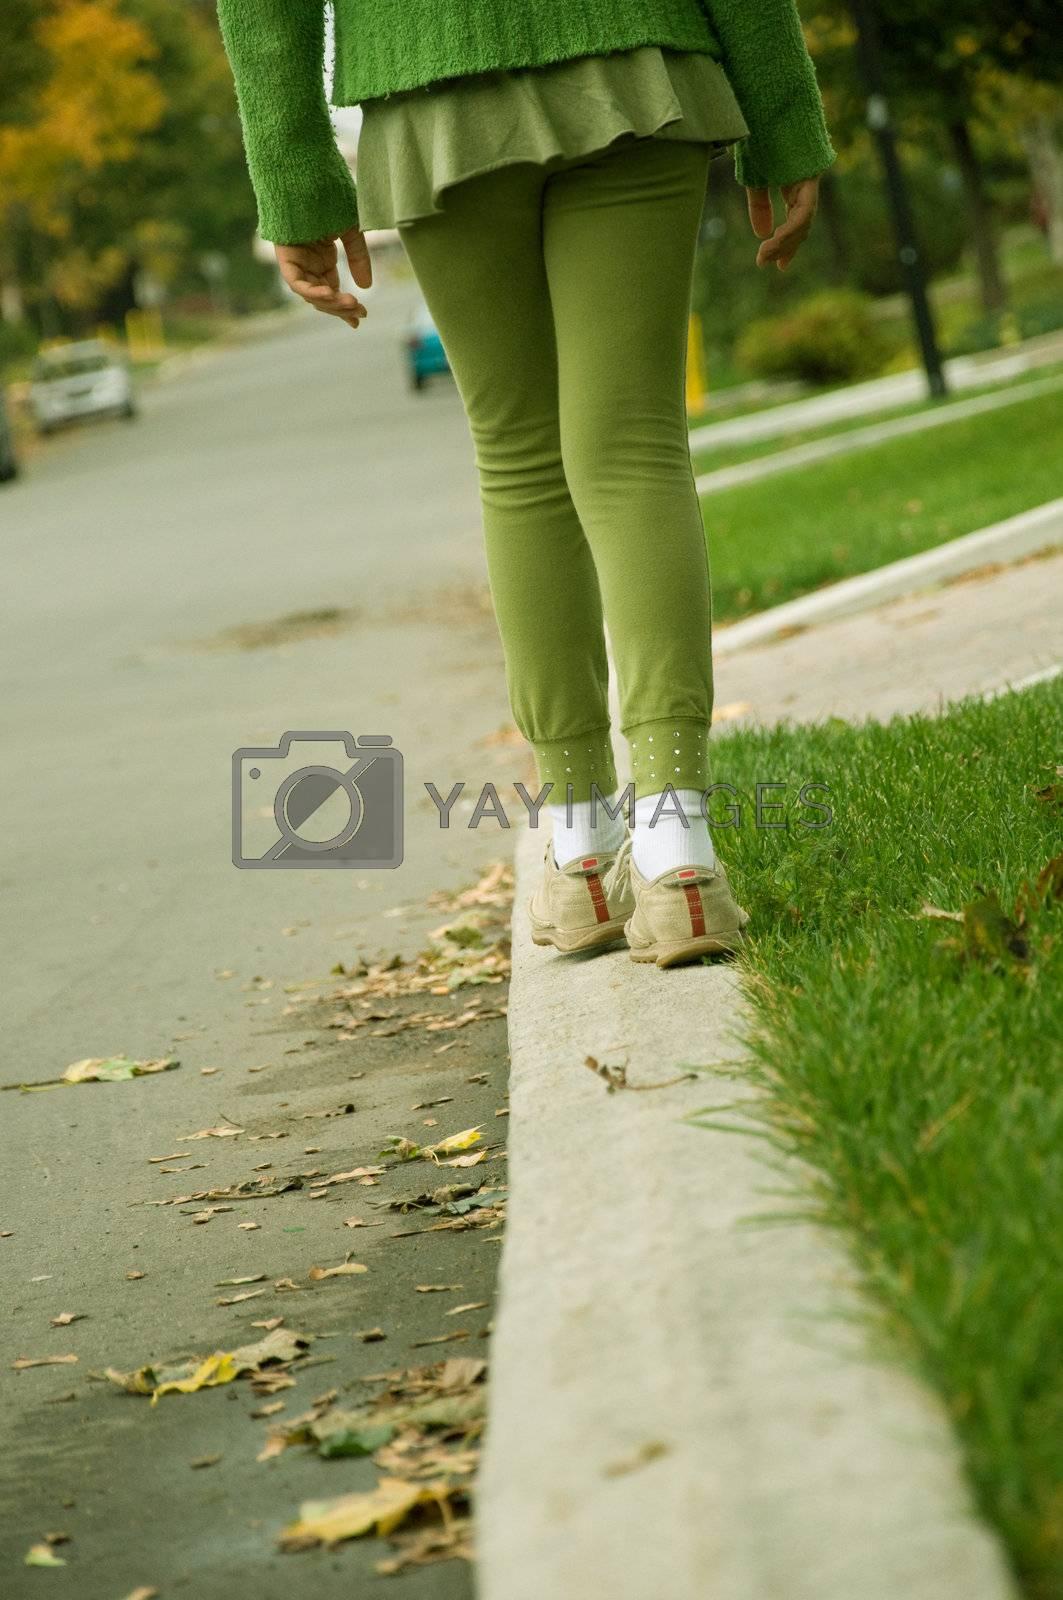 A girl balancing her self on the sidewalk.